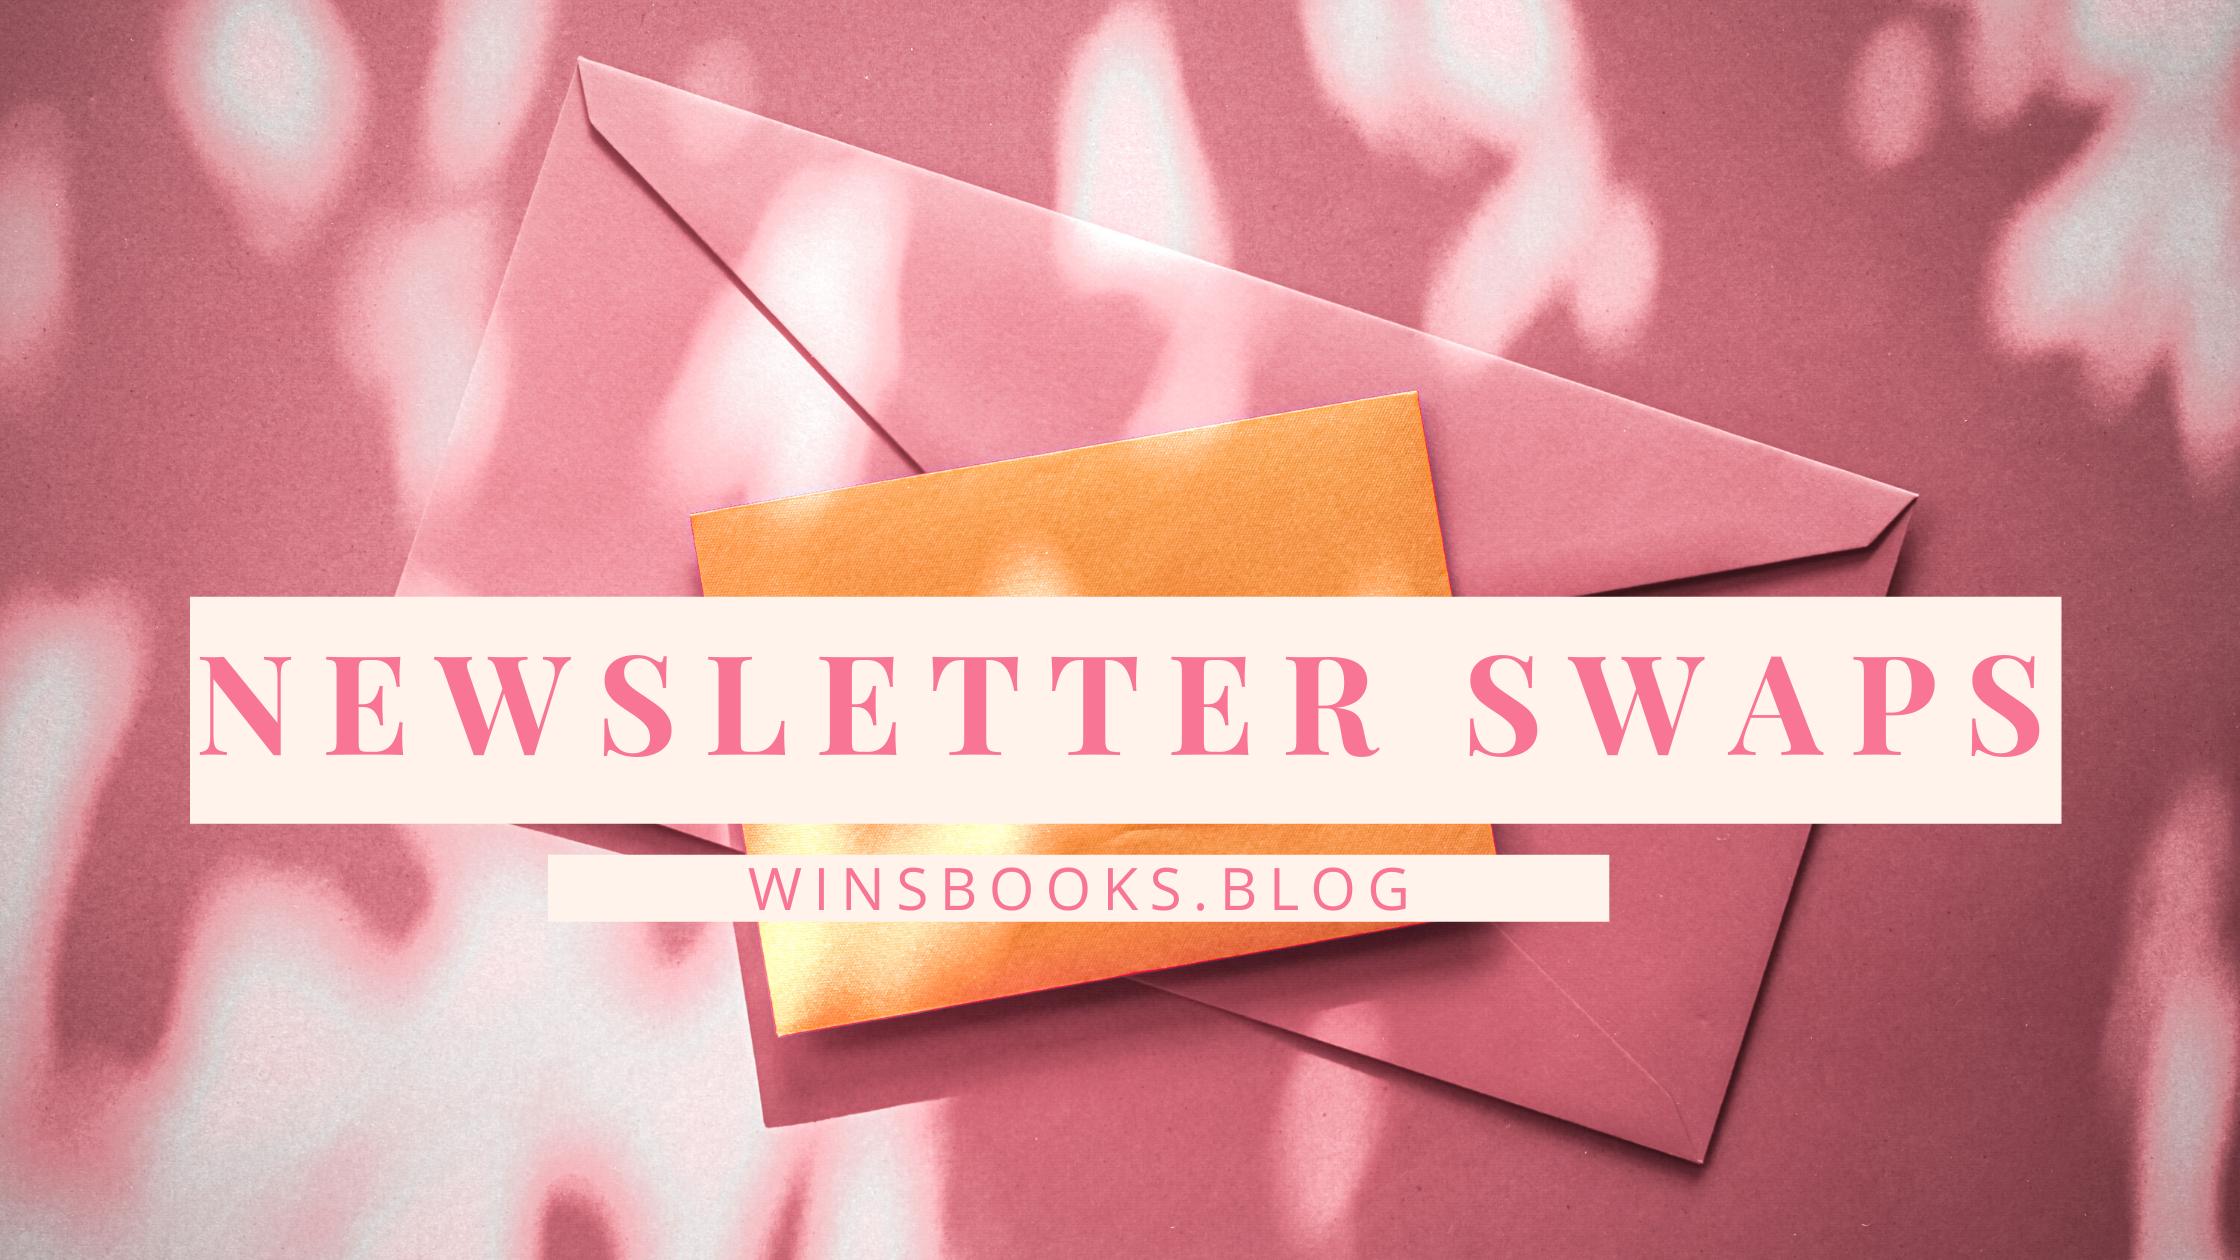 Newsletter Swaps on Win's Books